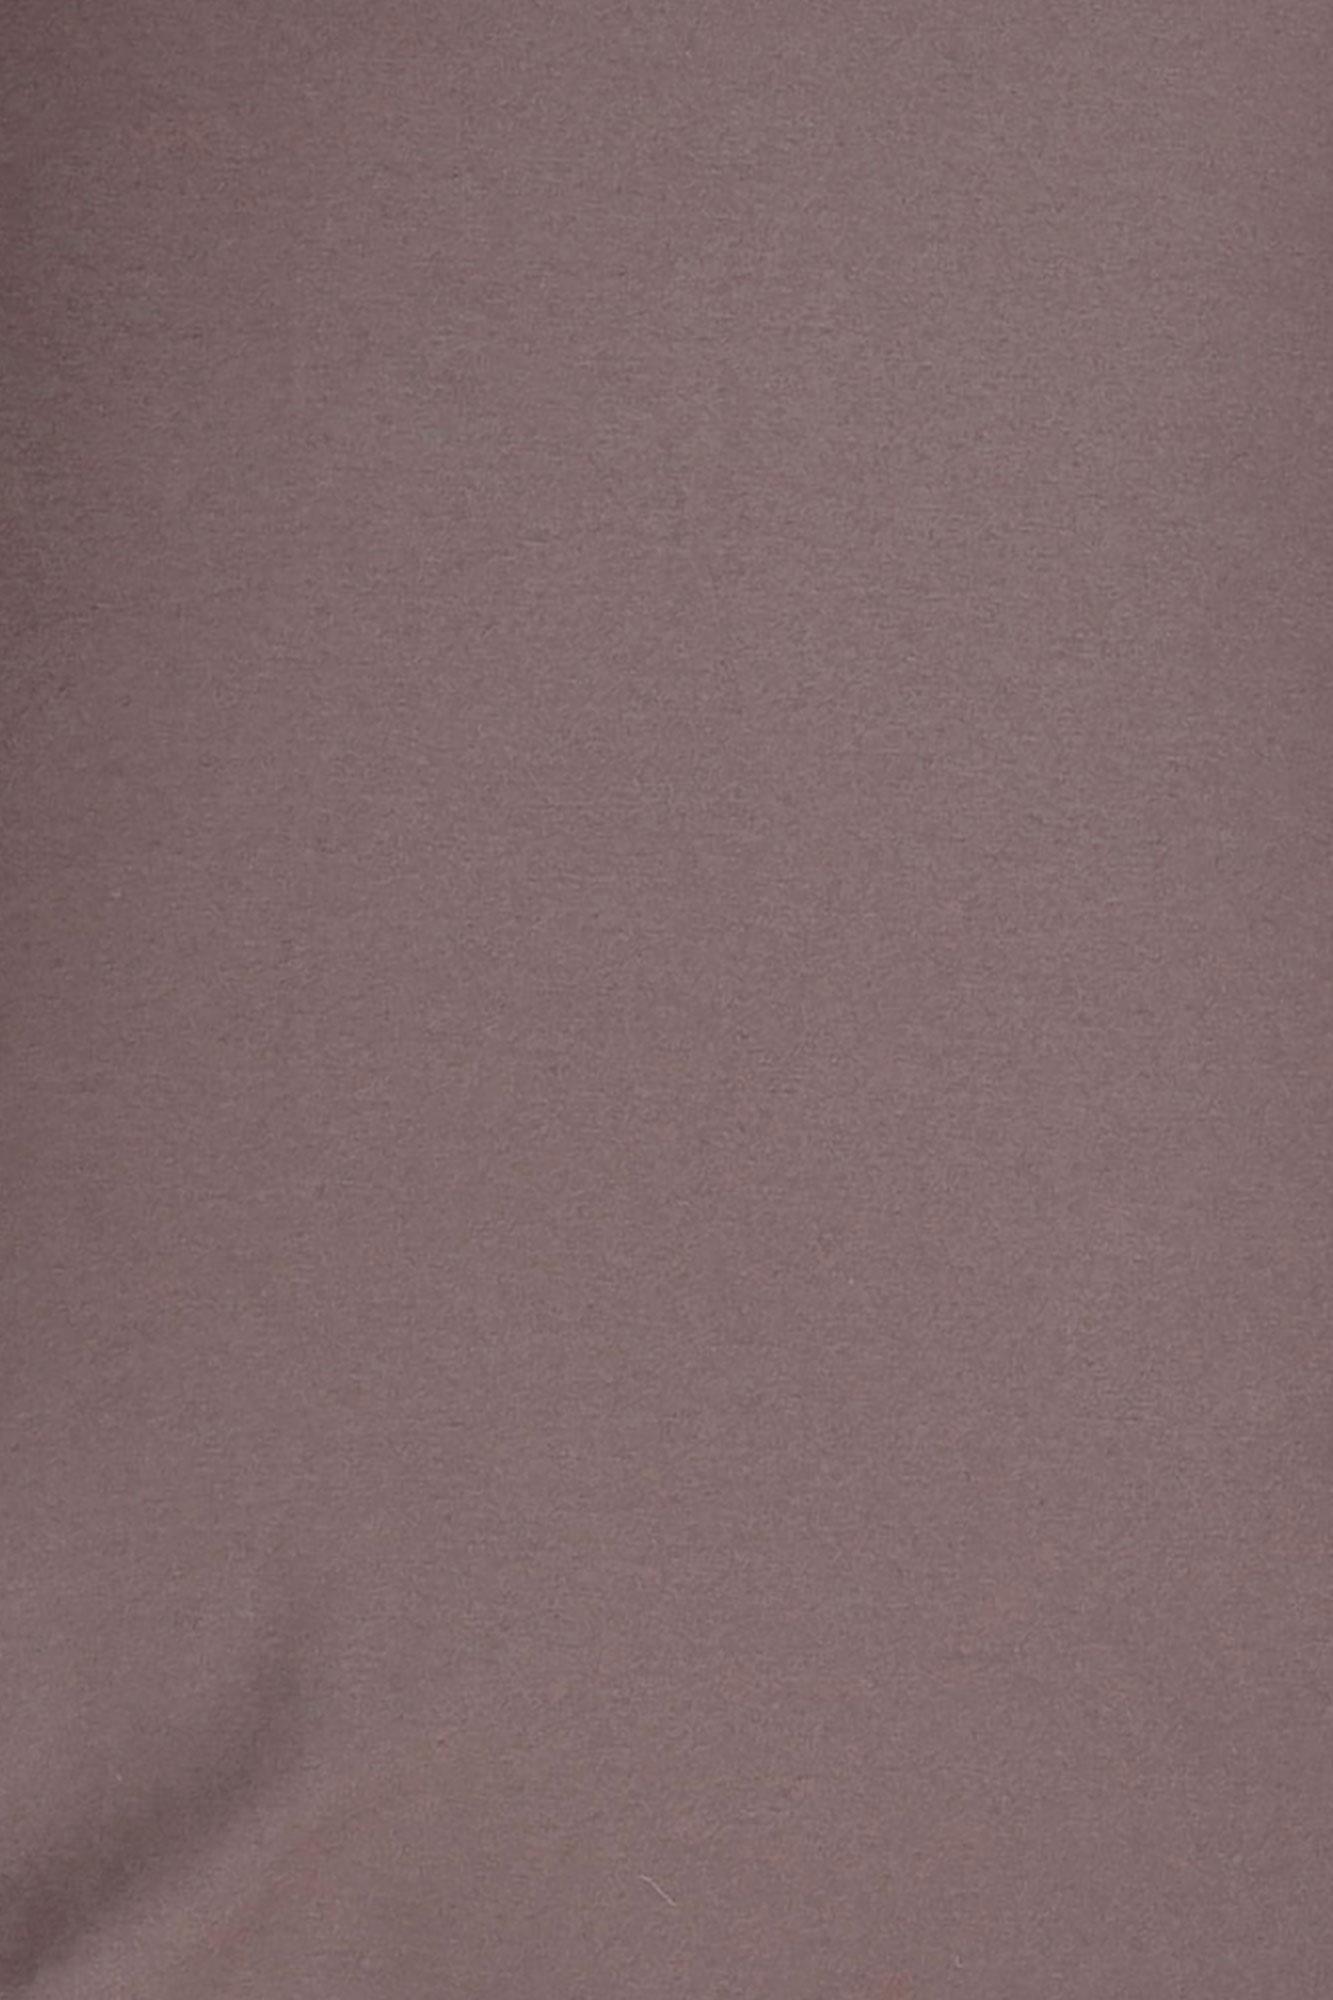 Lençol de elástico mini cama Grafite (sarja)